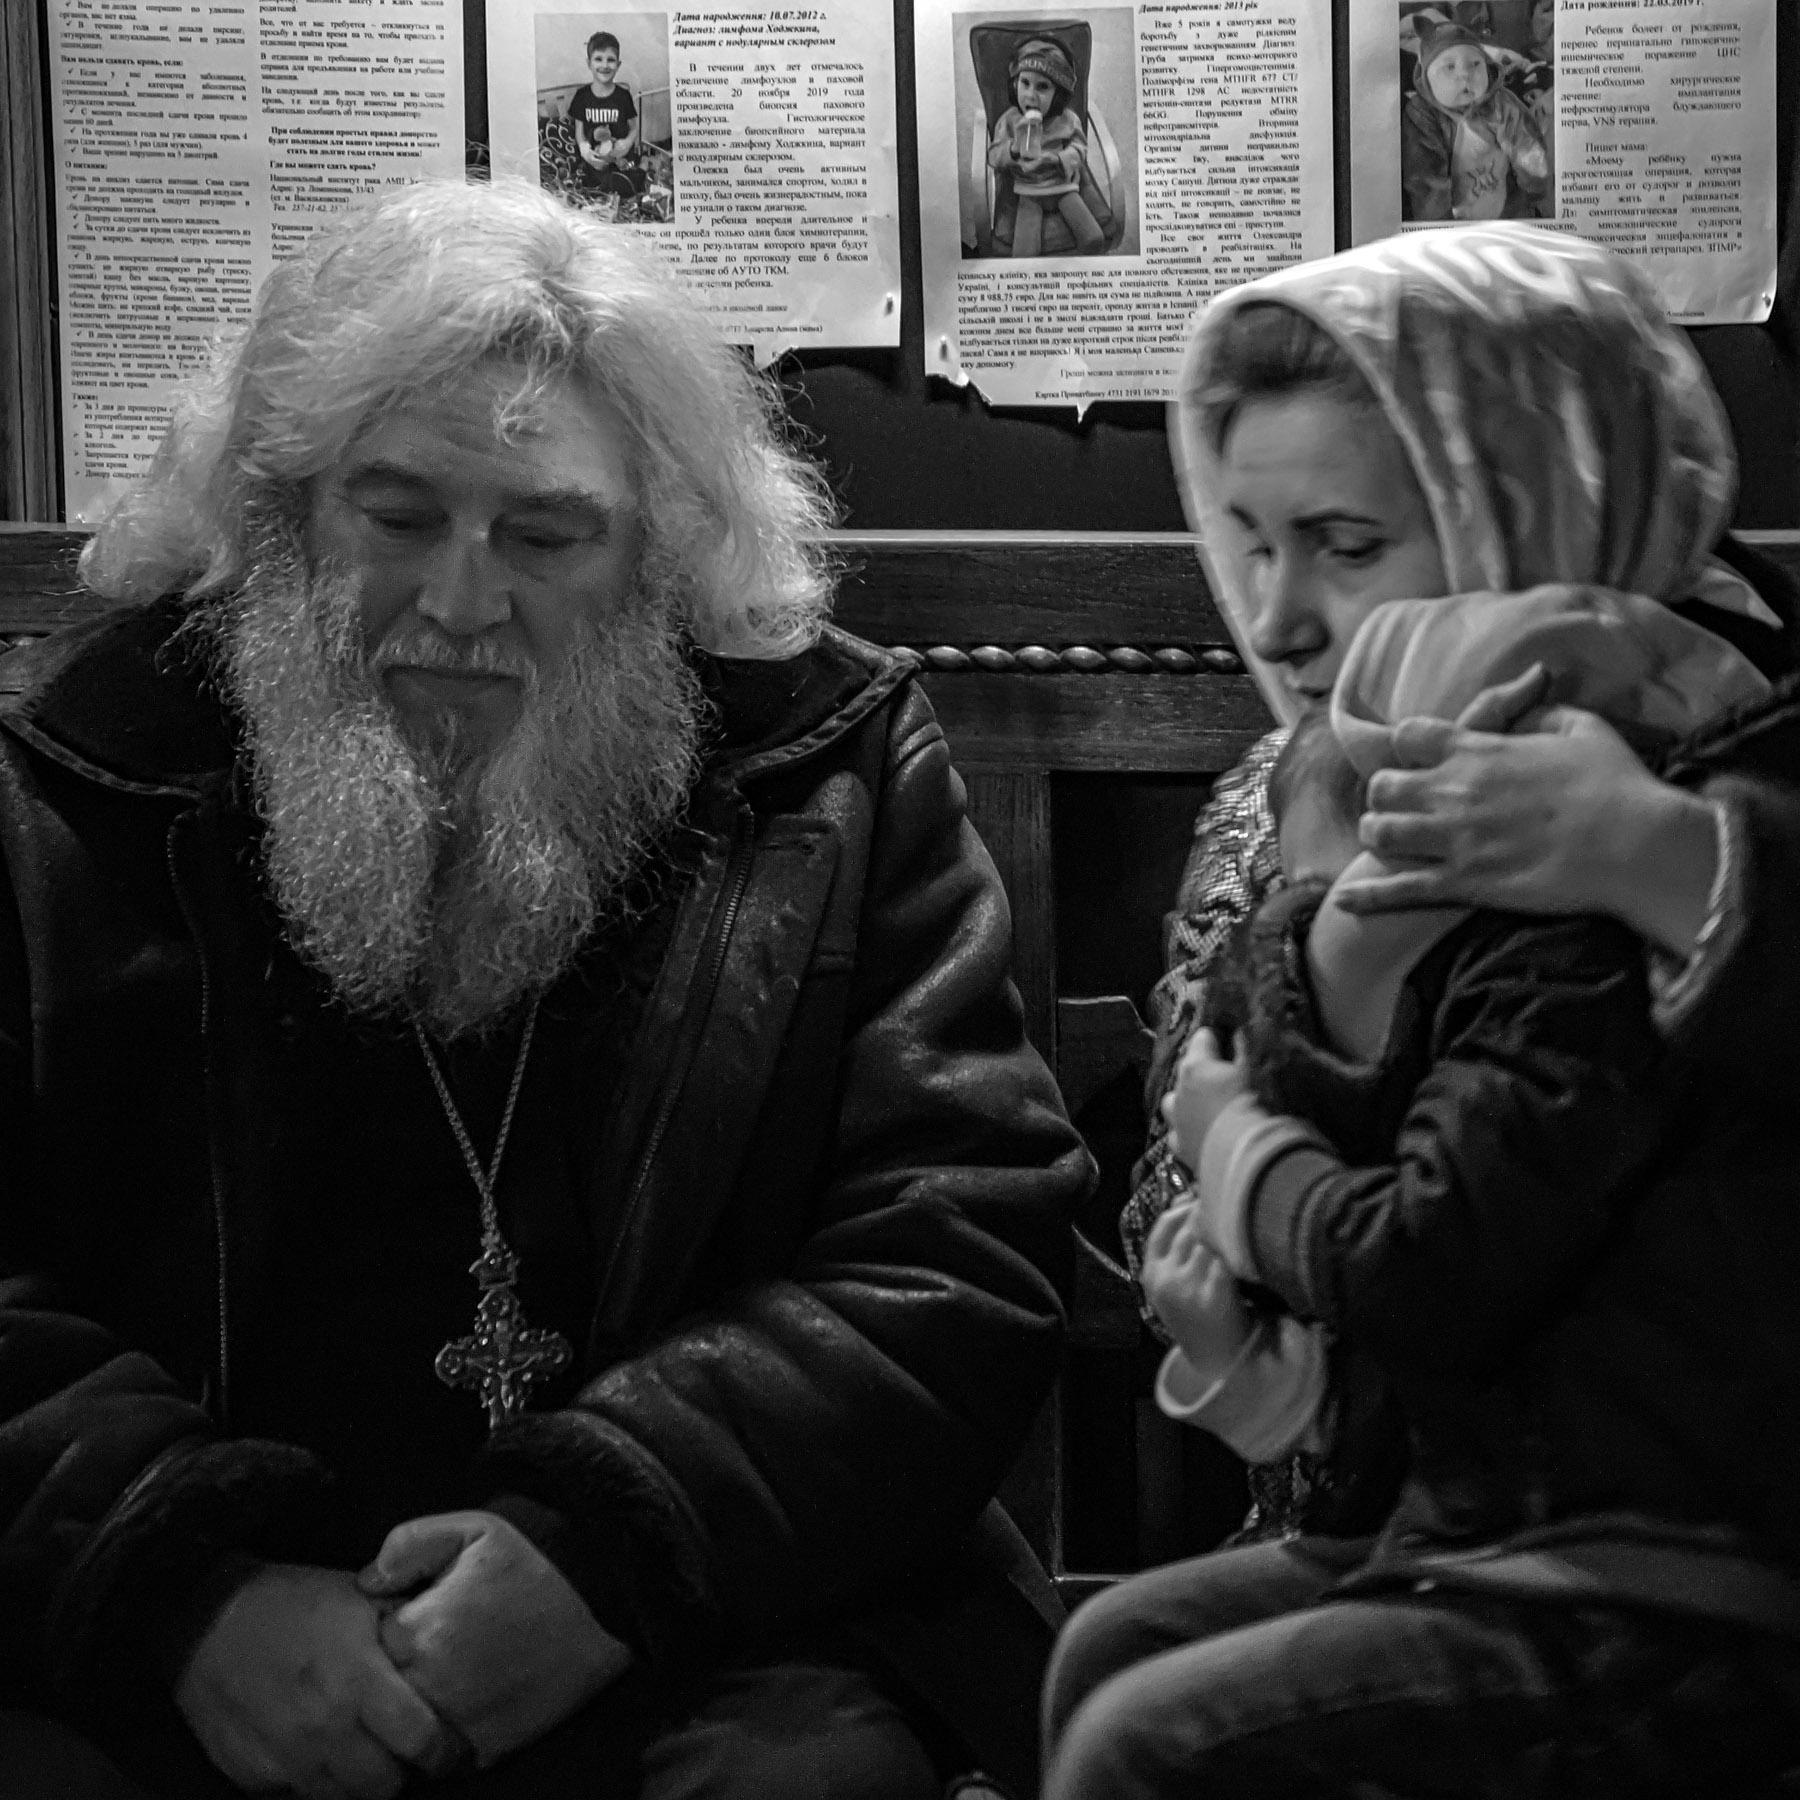 photos of orthodox christmas 0020 2